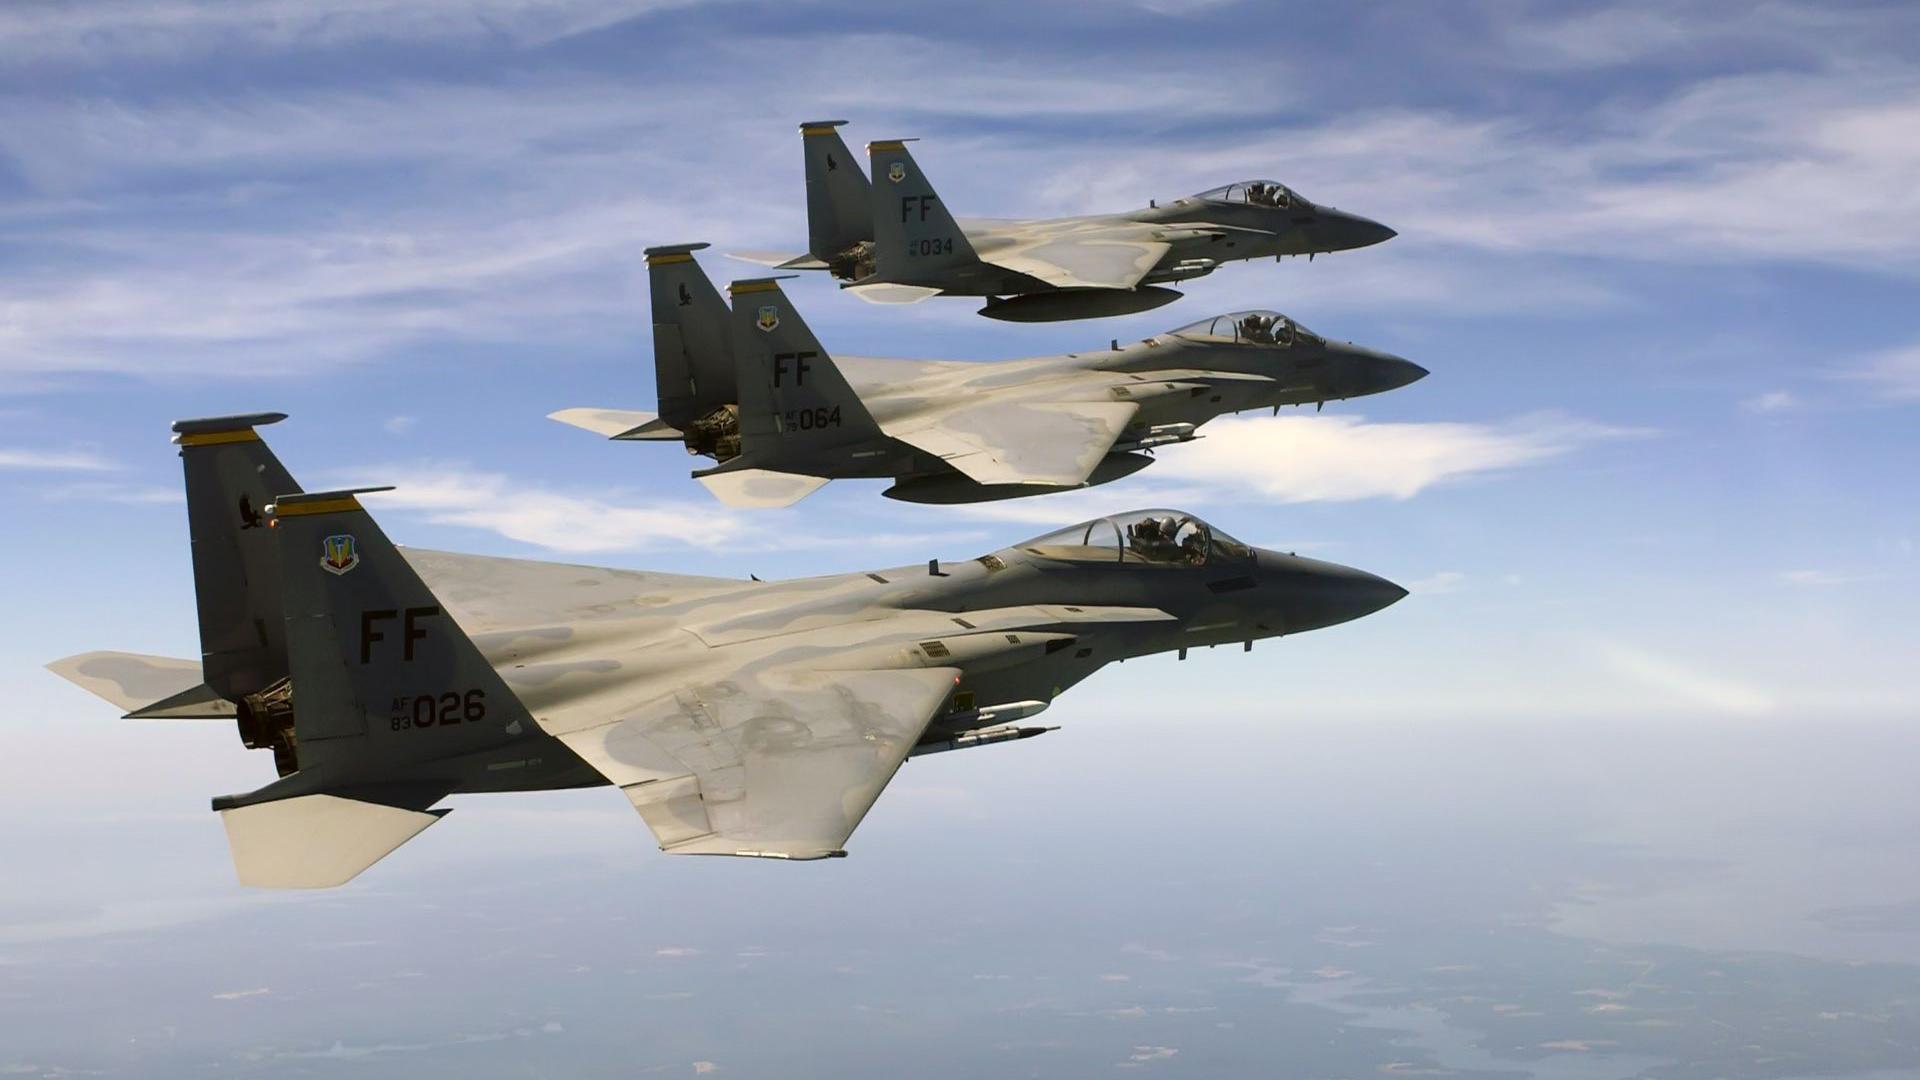 McDonnell Douglas F 15 Eagle HD Wallpaper Background Image 1920x1080